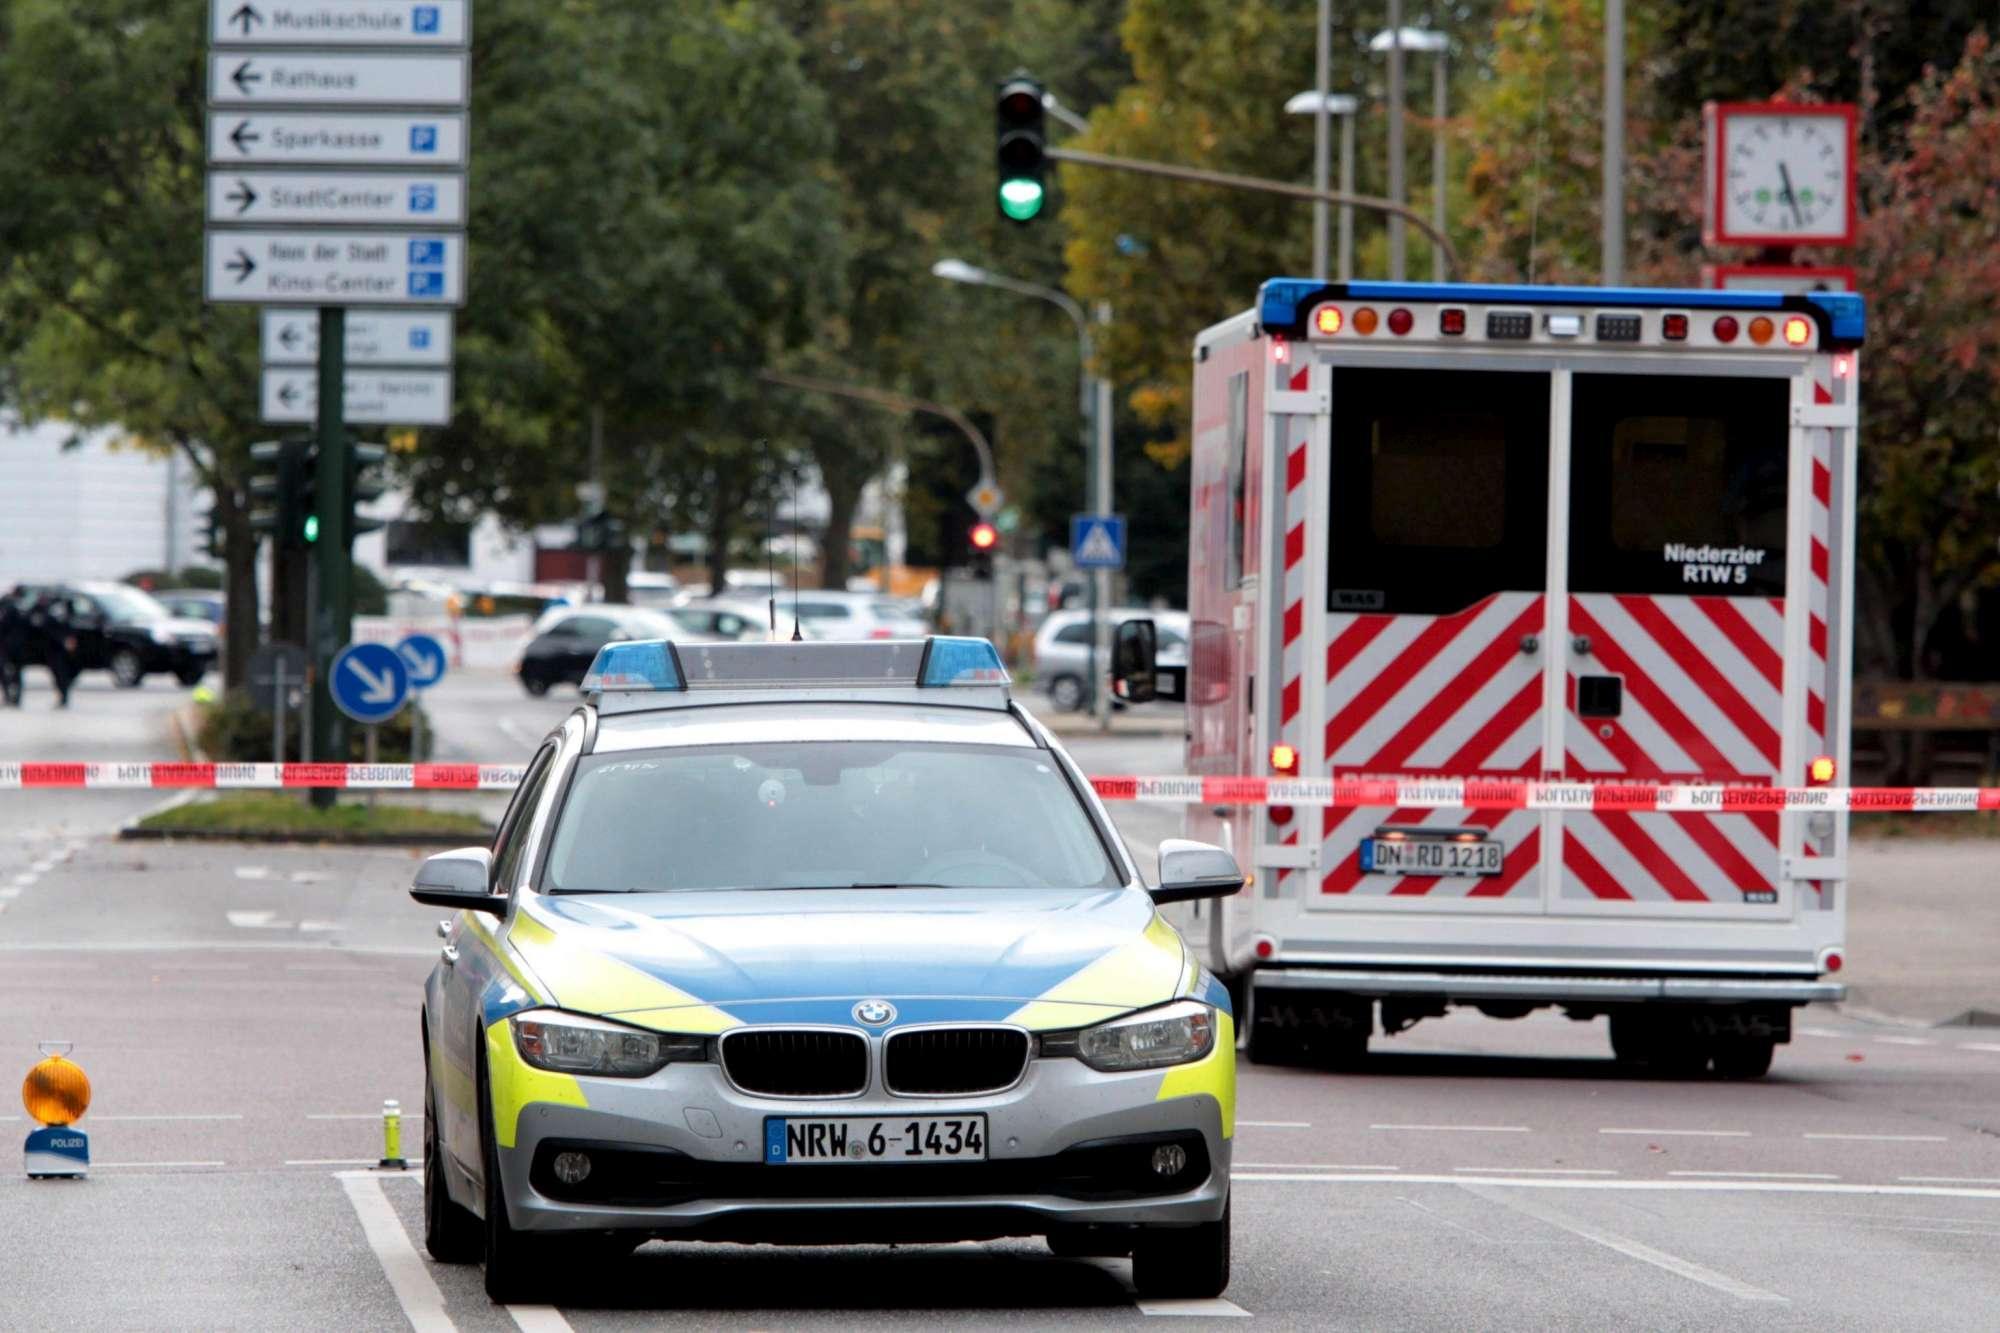 Paura in Germania sparatoria a Düren, un morto e un ferito